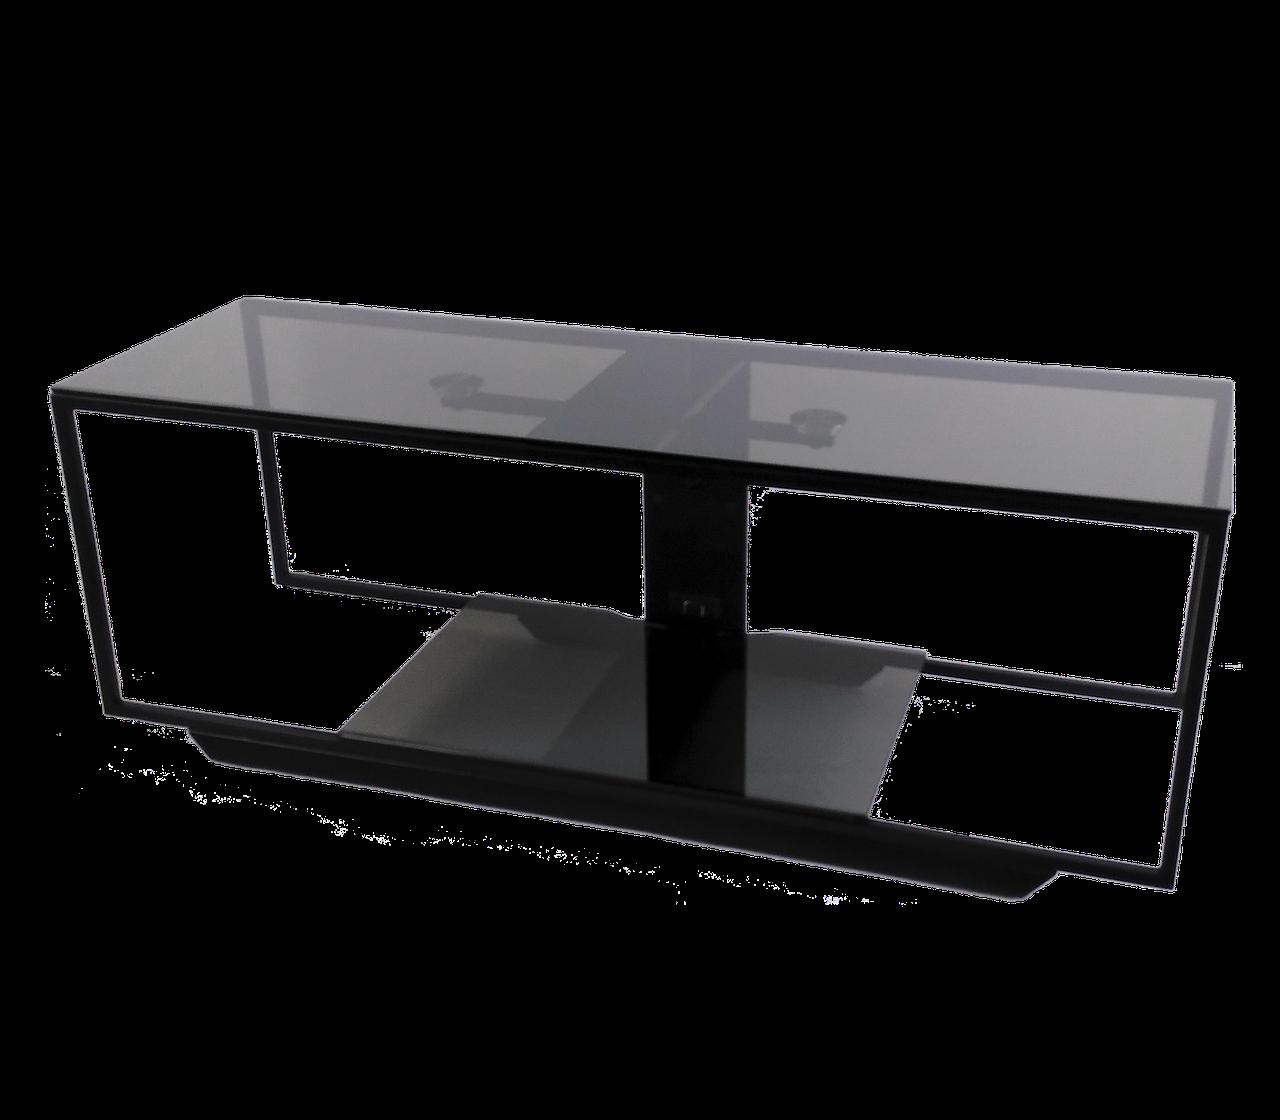 Скляна тумба під телевізори Commus Loft 1080 gray540 bl (1080x340x380)